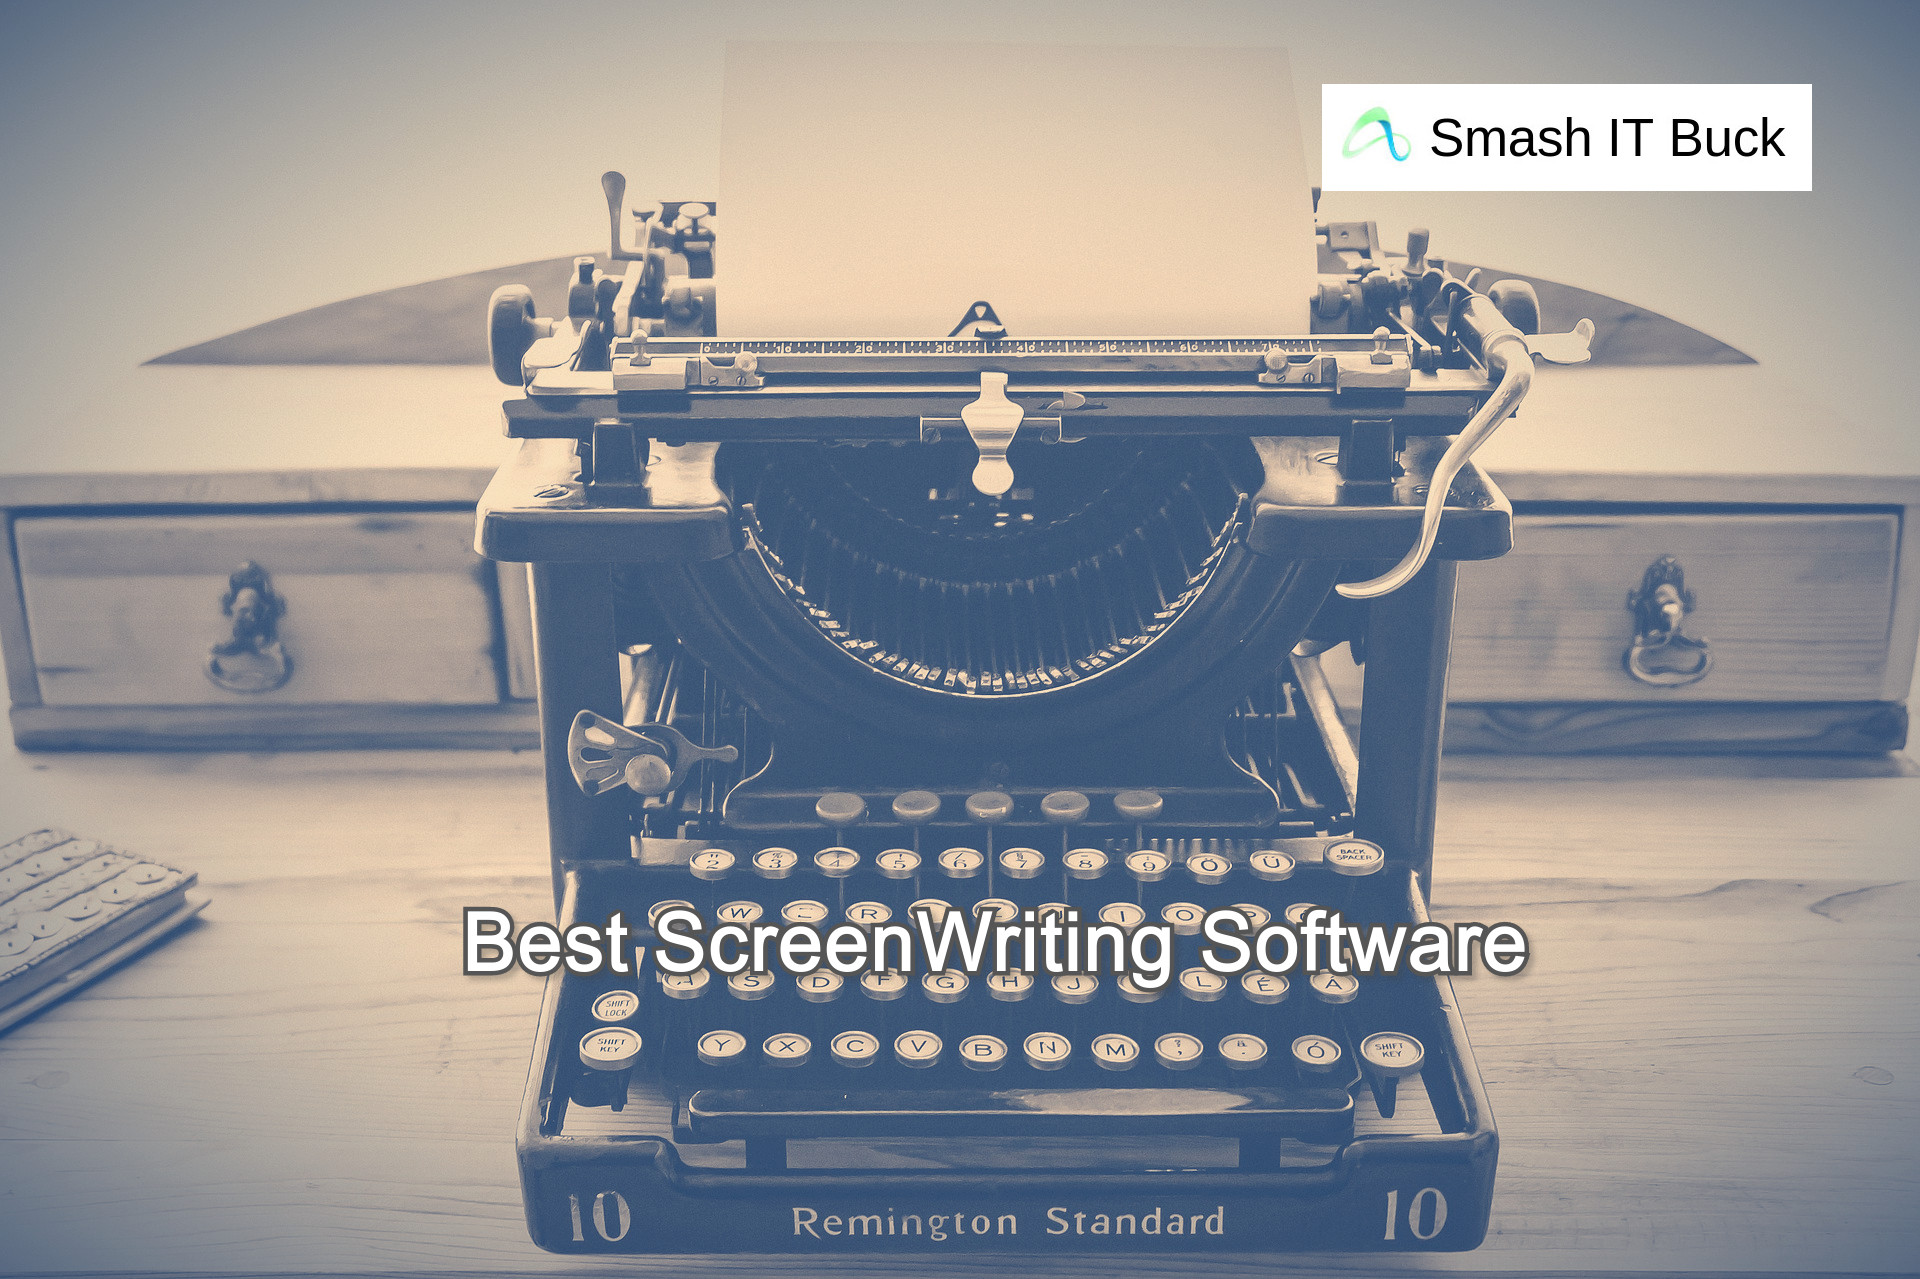 Best Screenwriting Software of 2021